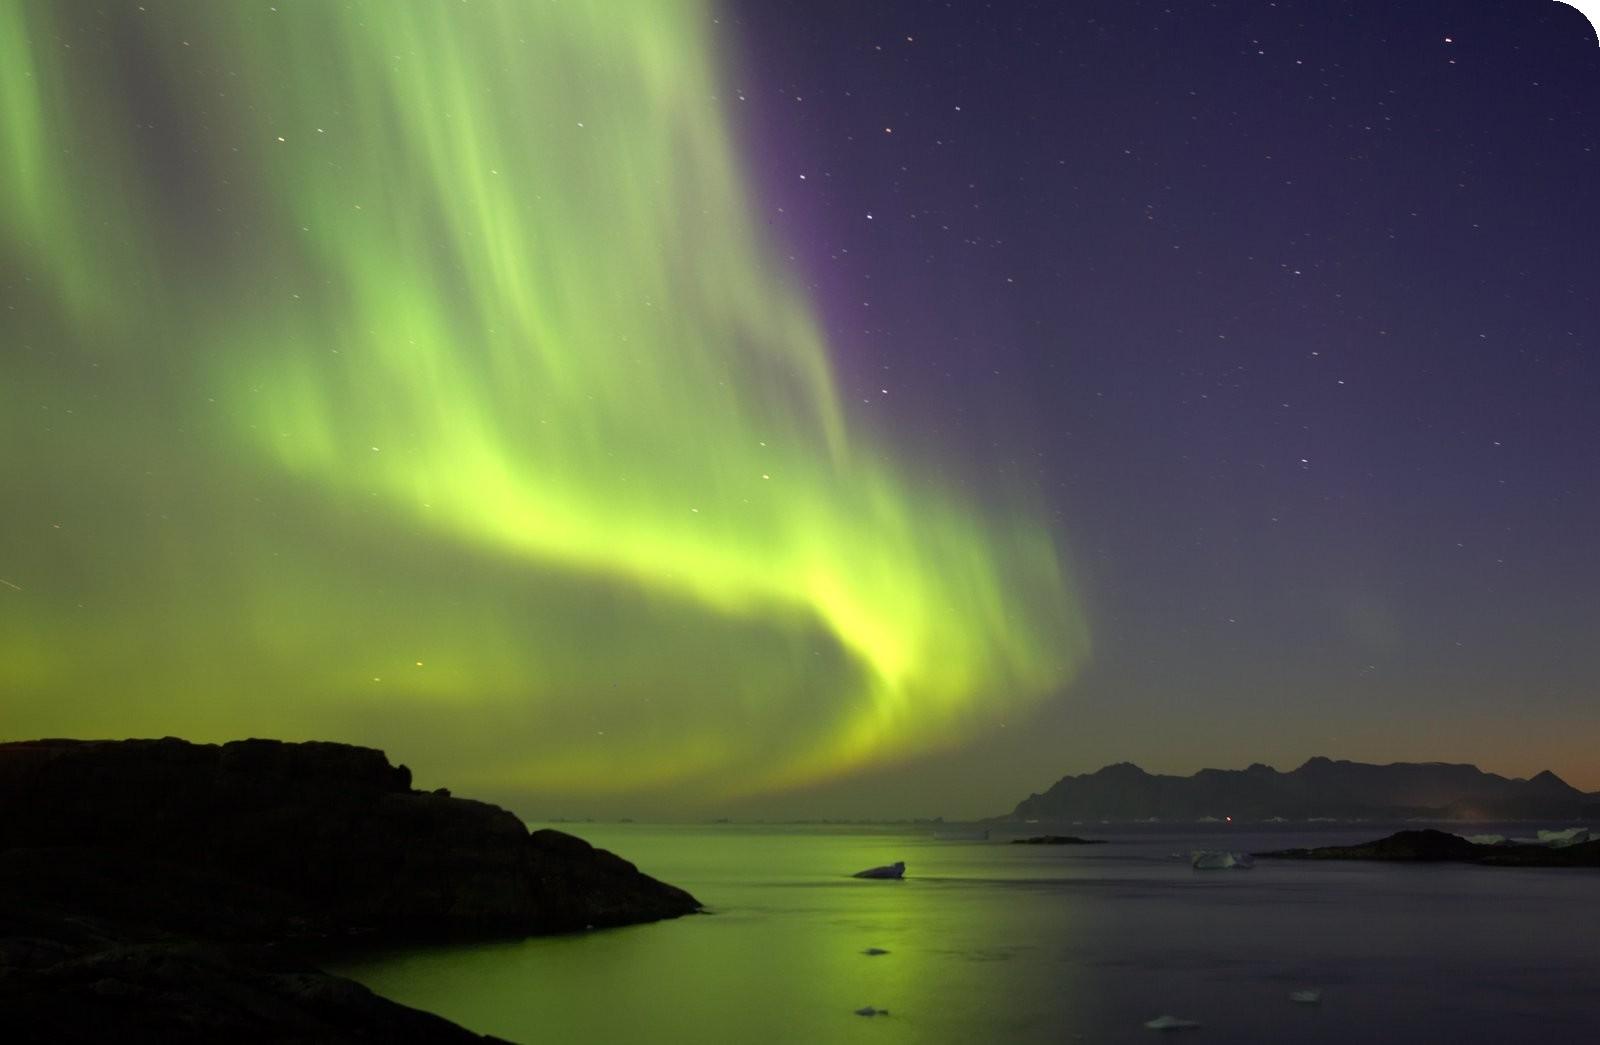 http://4.bp.blogspot.com/_DoDuN8q1K24/TF89co54y7I/AAAAAAAAALM/bz4rrBHRItU/s1600/Northern+Lights+over+the+fjords.jpg